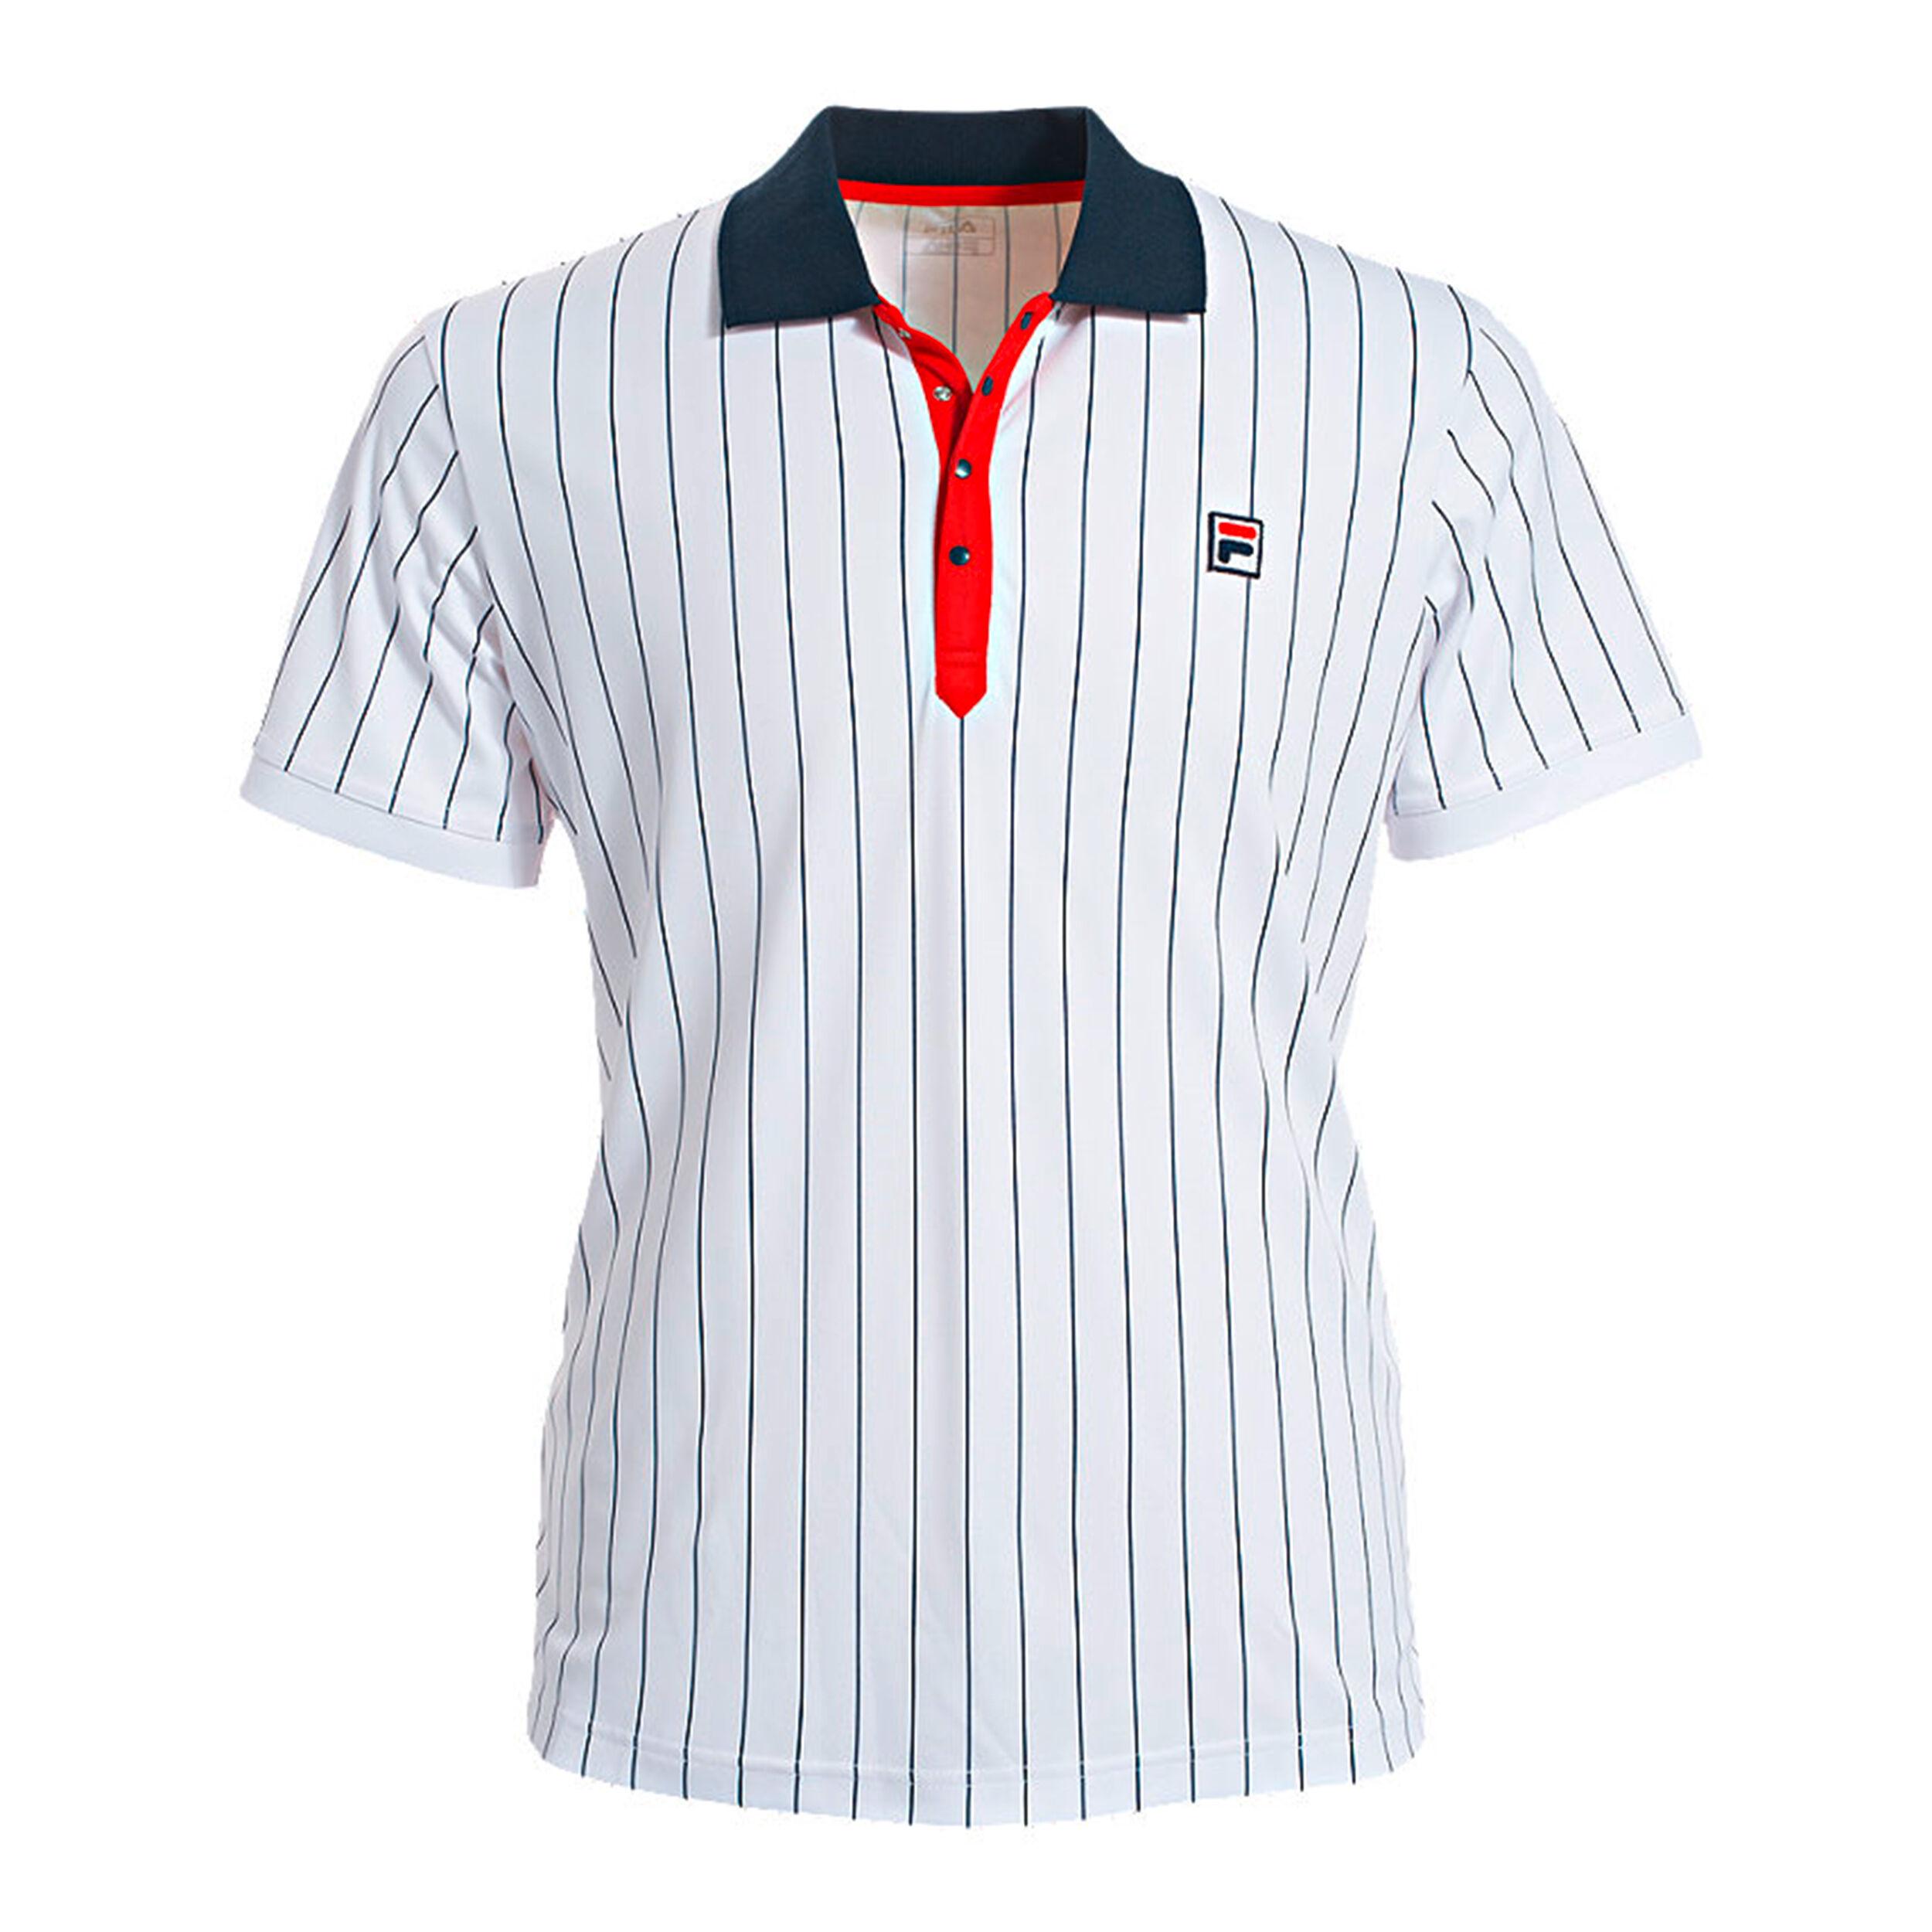 Stripes Polo Herren Weiß, Dunkelblau